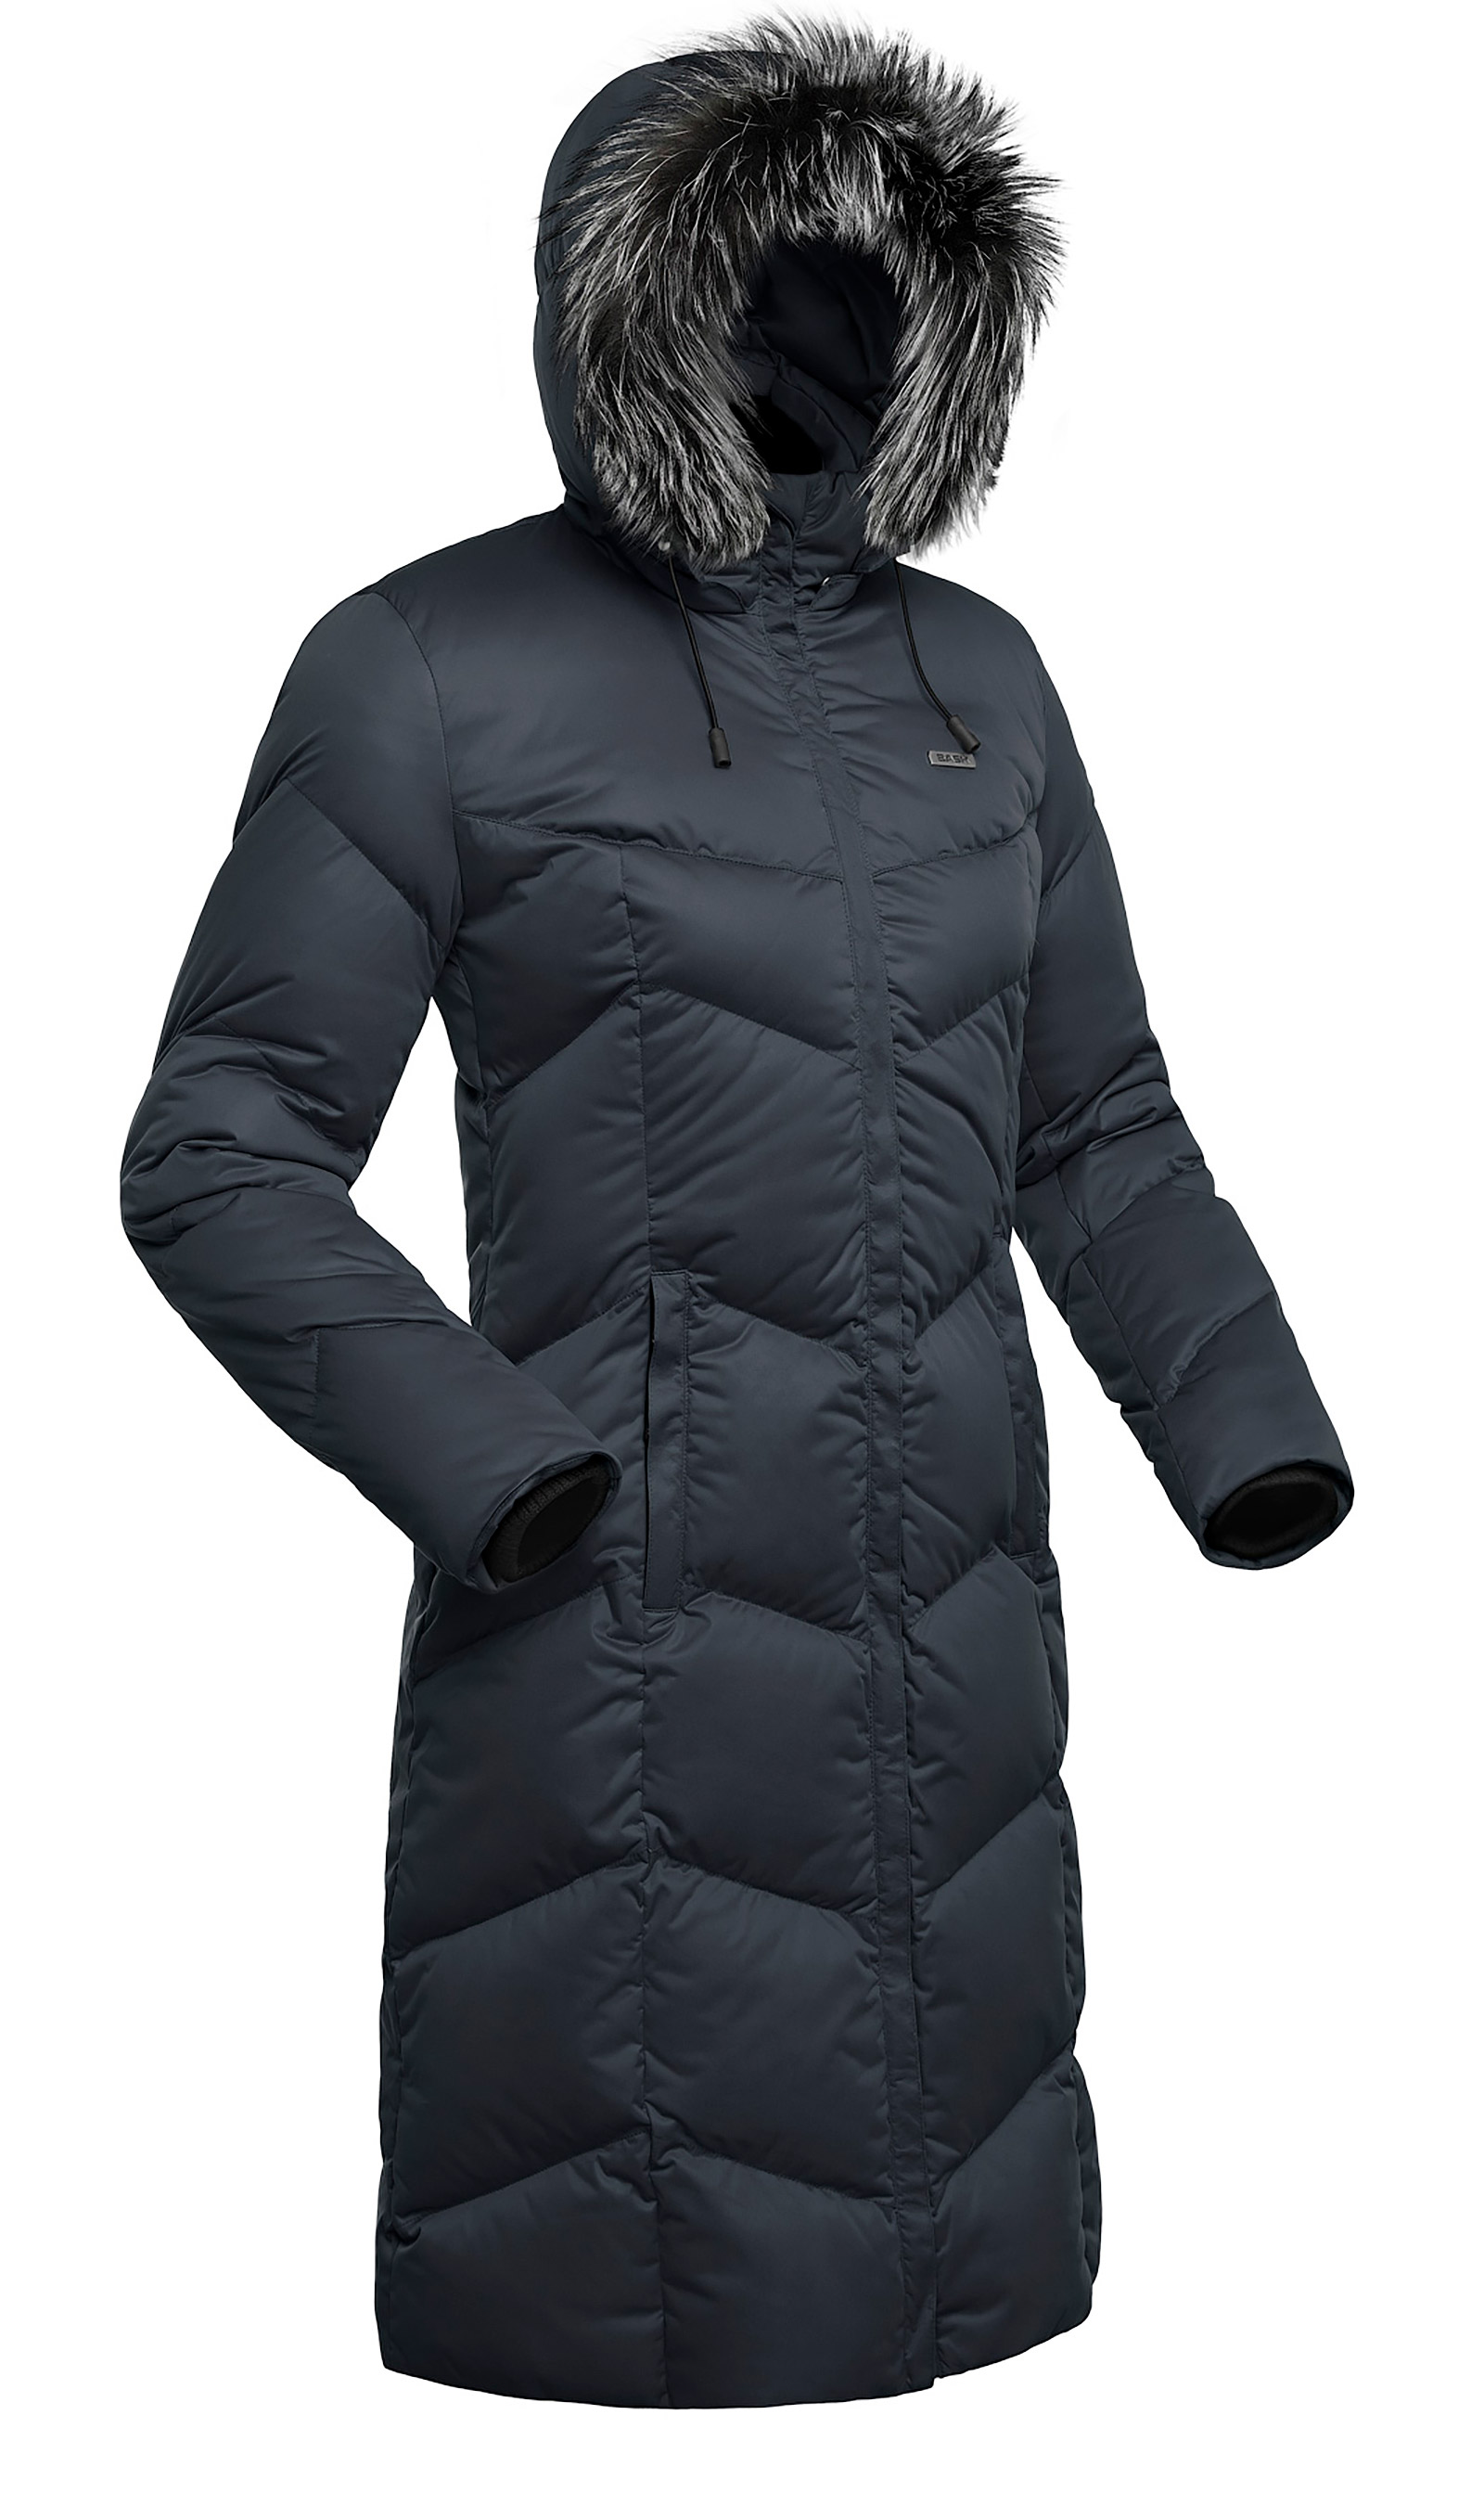 Пальто пуховое женское BASK SNOWFLAKE черное, Пальто - арт. 494740409